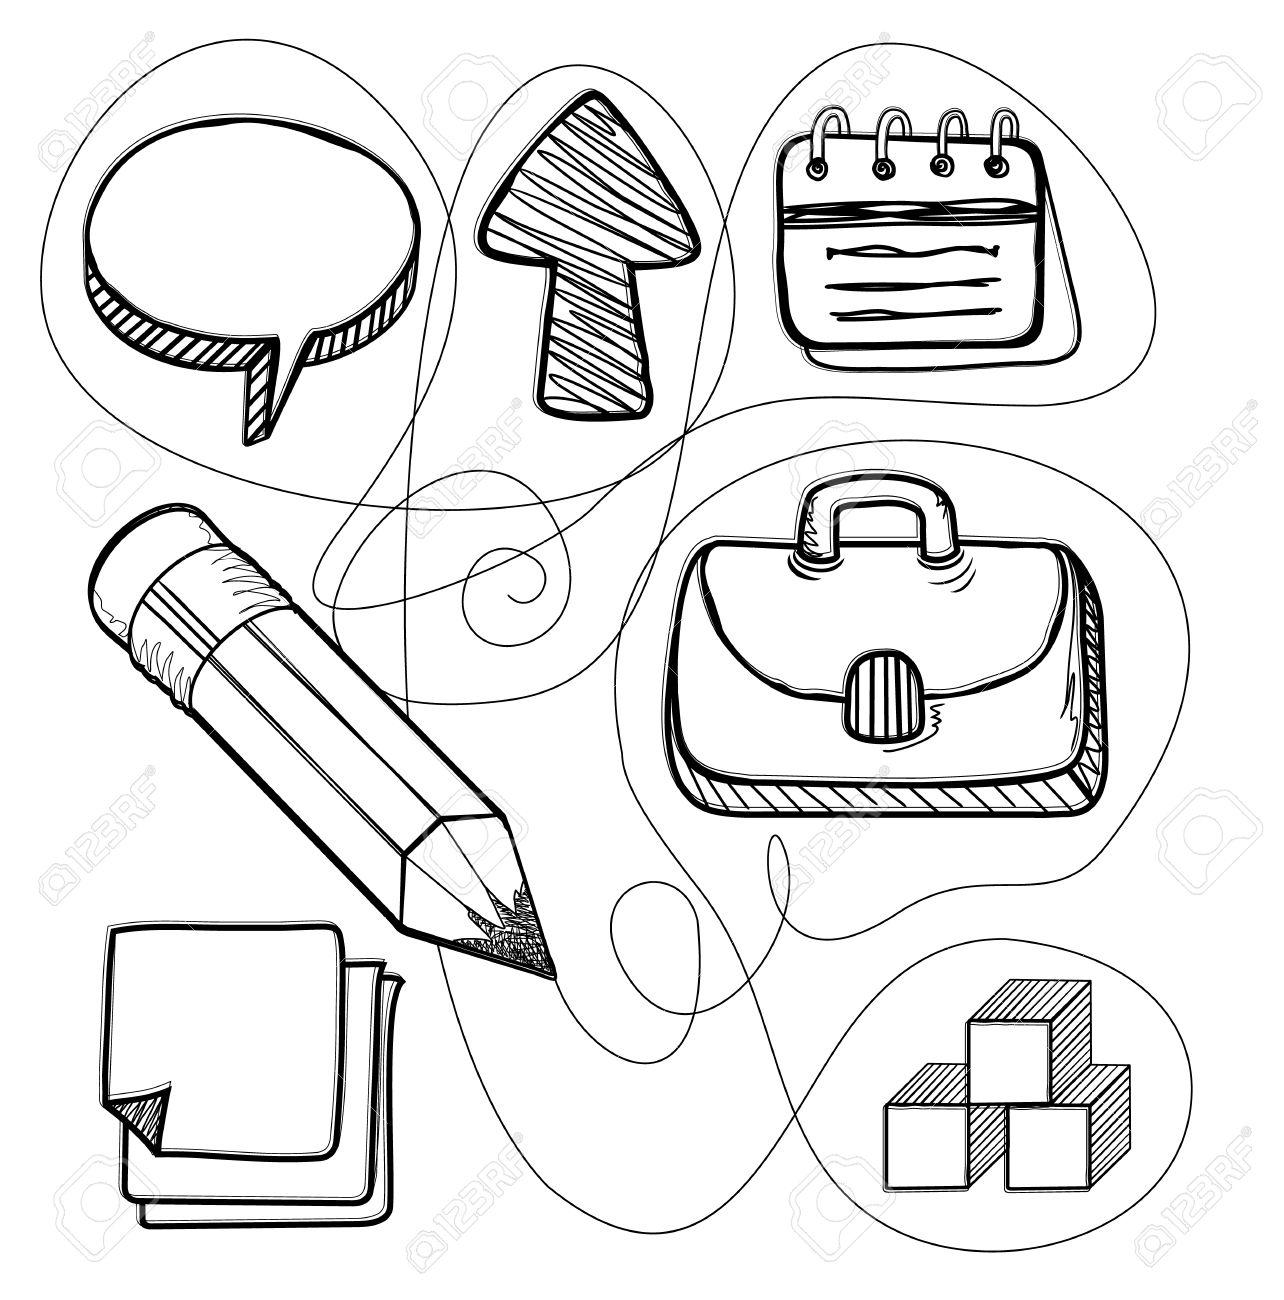 1284x1300 Hand Drawn Management Design Line. Management Business Drawing